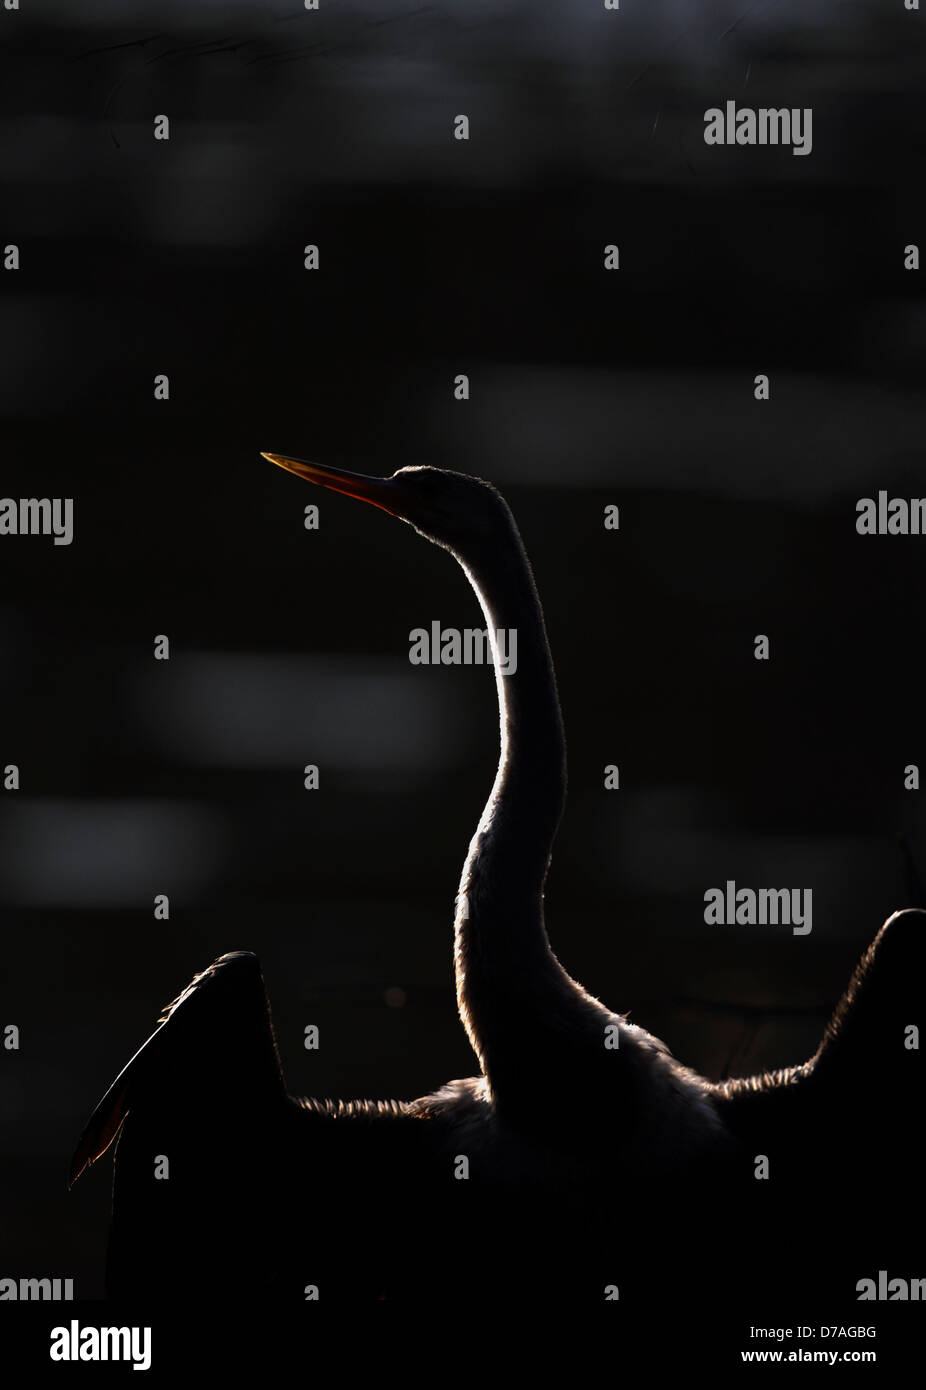 Portarait of snake bird in Keoladeo National Park, Bharatpur, Rajasthan, India back lit - Stock Image